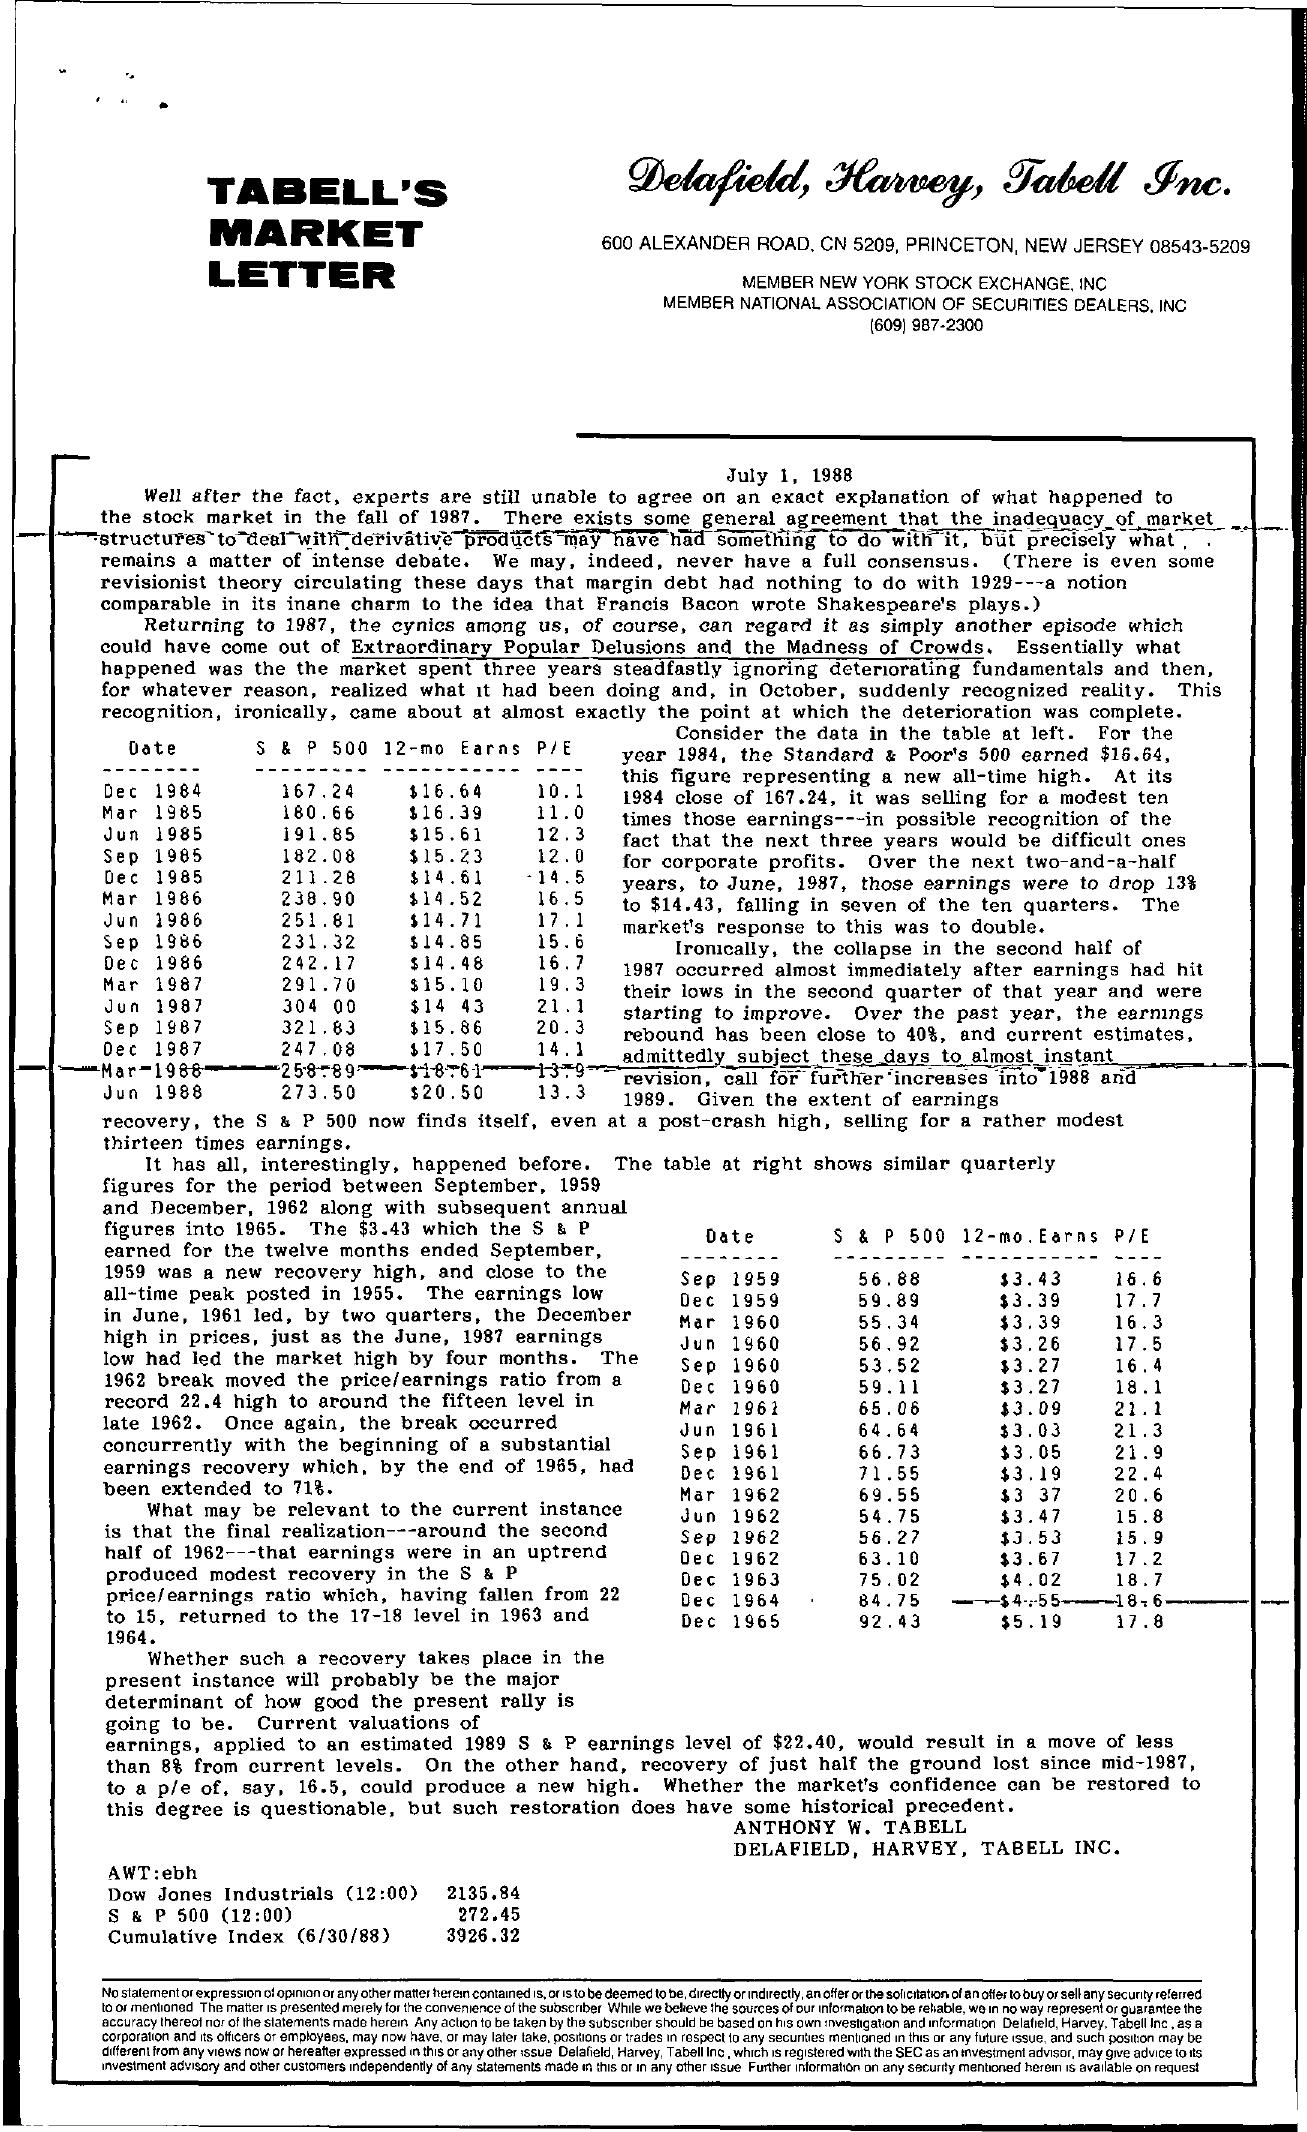 Tabell's Market Letter - July 01, 1988